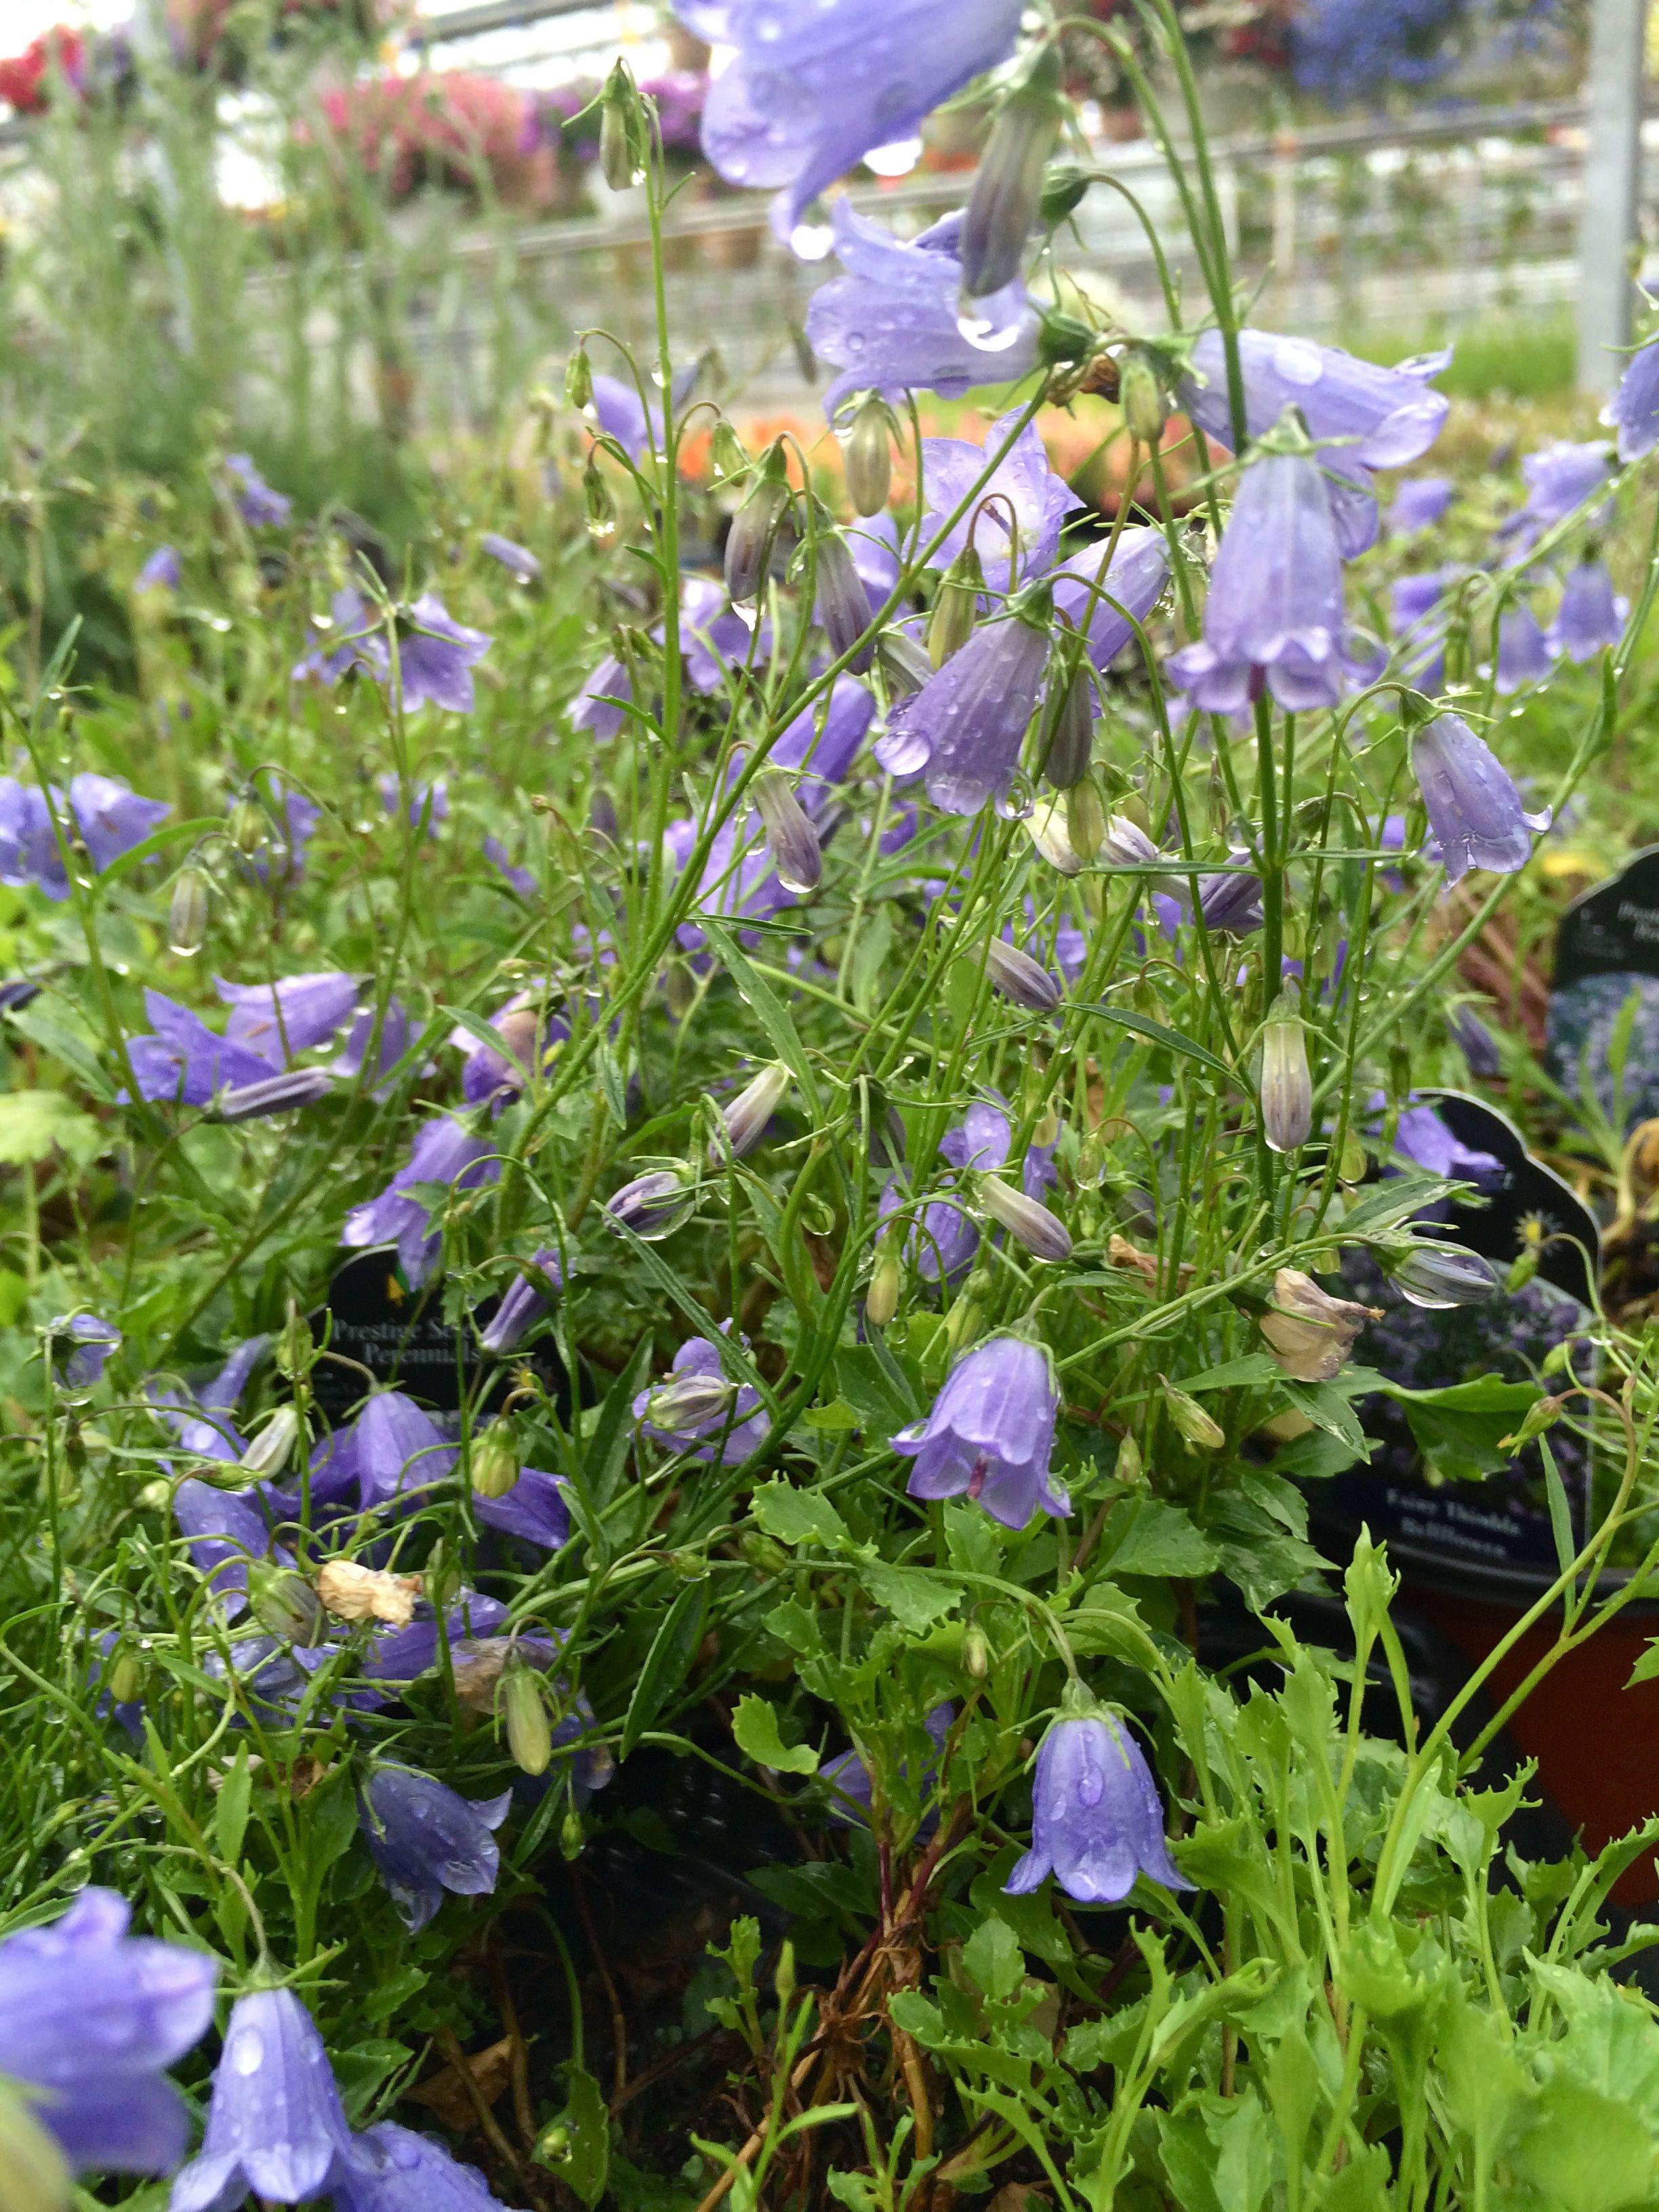 Campanula Fairy Thimble Bellflower Planting Flowers Blue Flowering Plants Plants